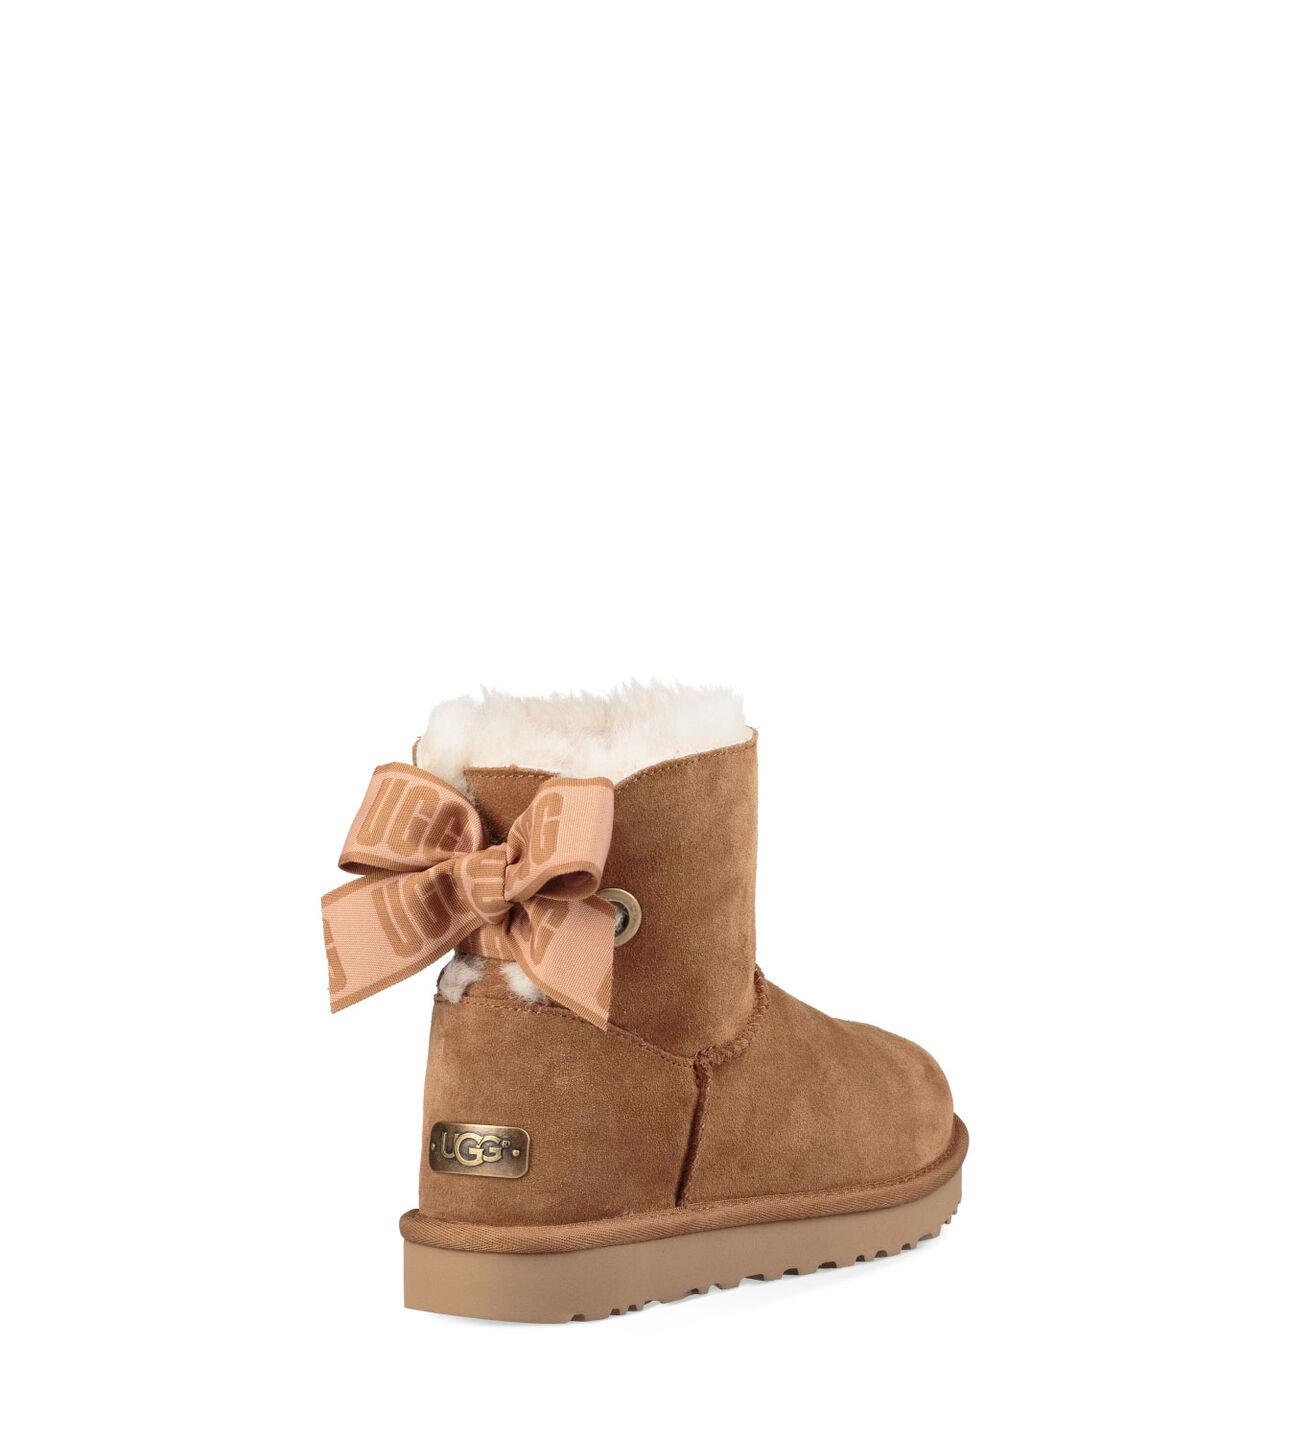 b7697ea583a Customizable Bailey Bow Mini Boot